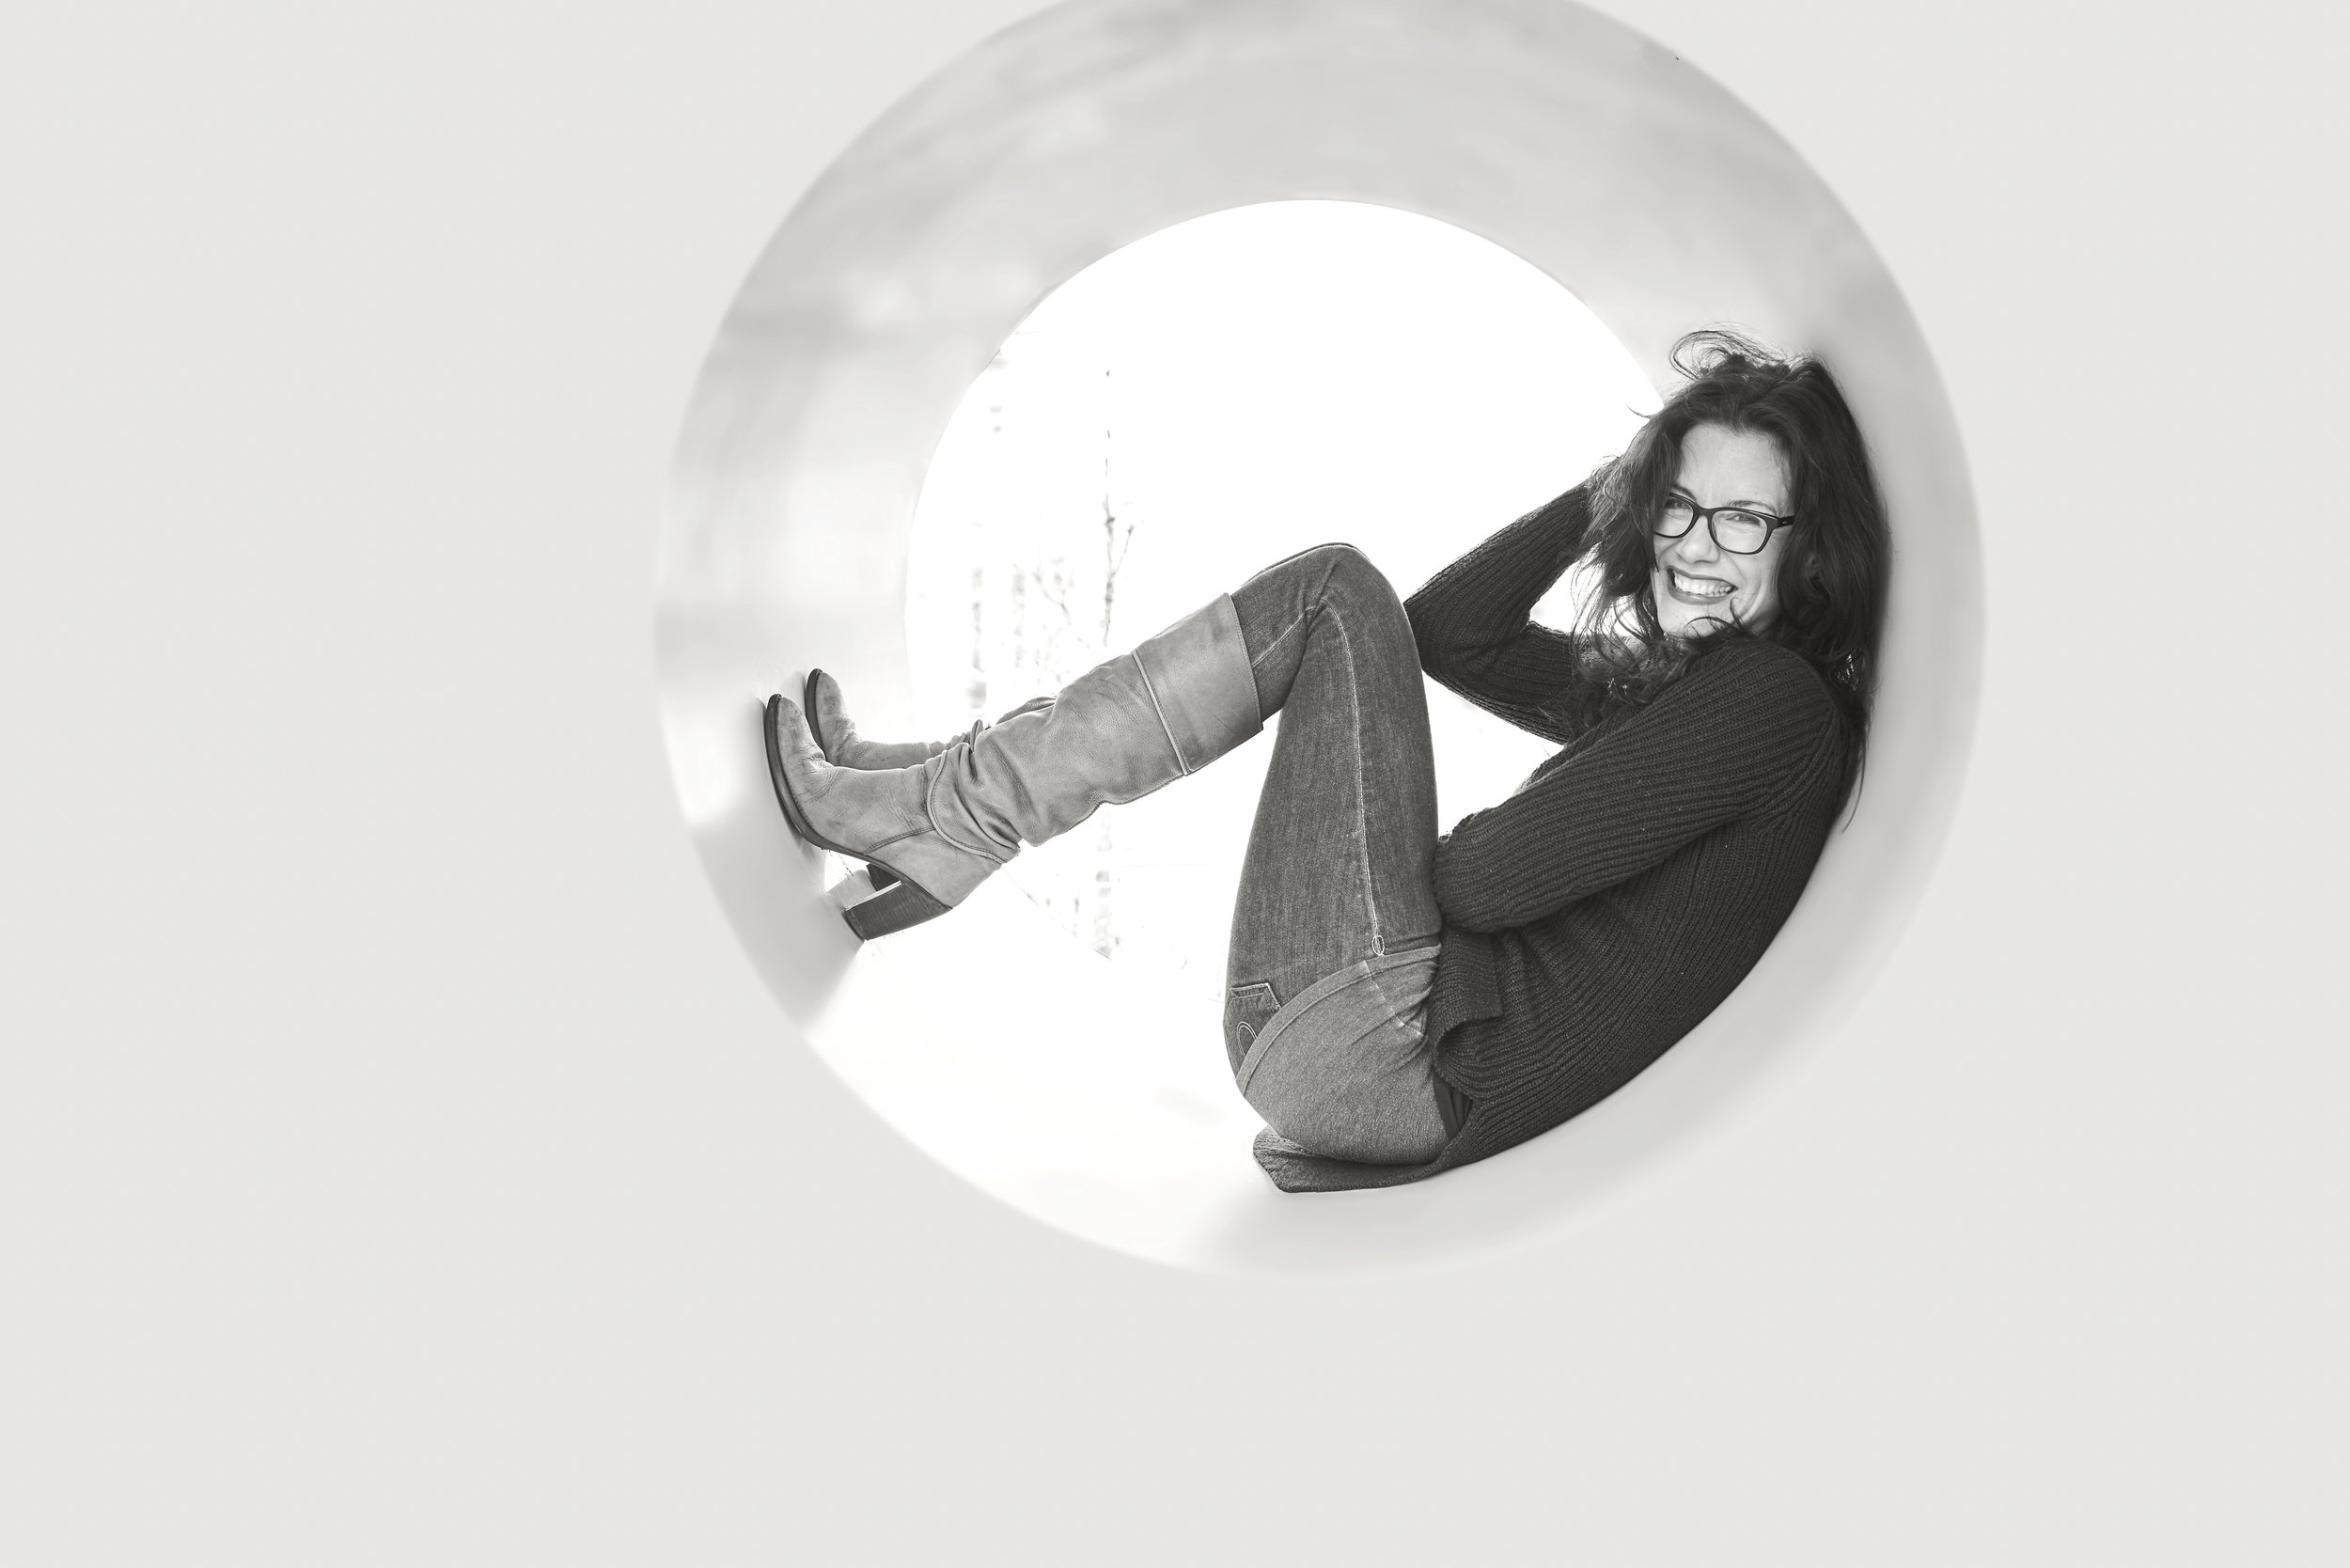 Abel-JessicaBlank-Portraits-HQ-13 copy.jpg